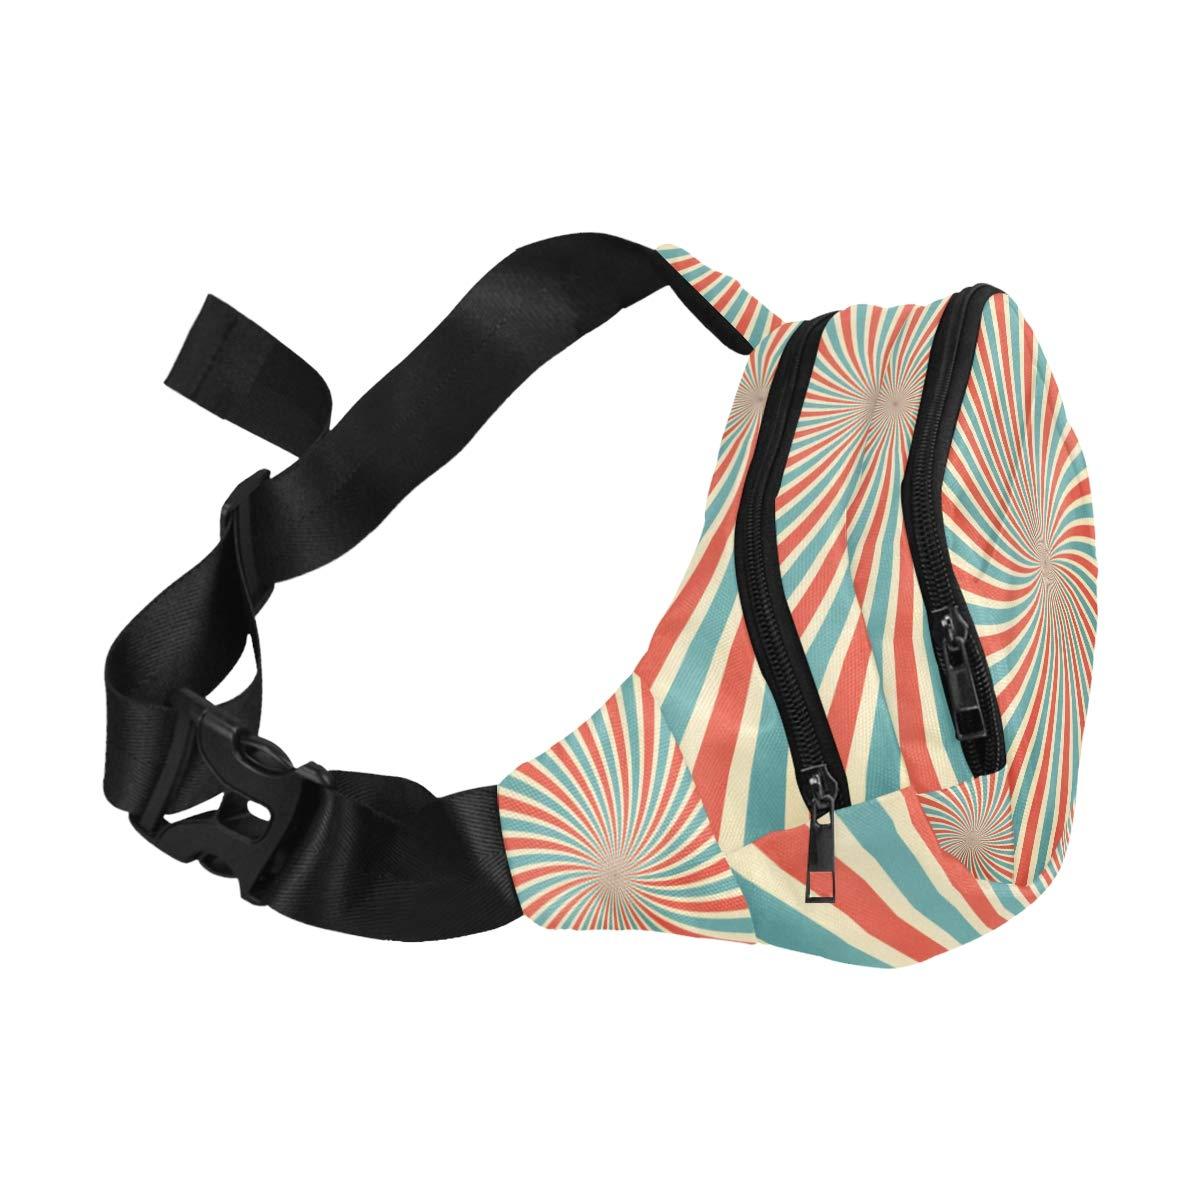 Sunlight Blue And Red Color Burst Fenny Packs Waist Bags Adjustable Belt Waterproof Nylon Travel Running Sport Vacation Party For Men Women Boys Girls Kids